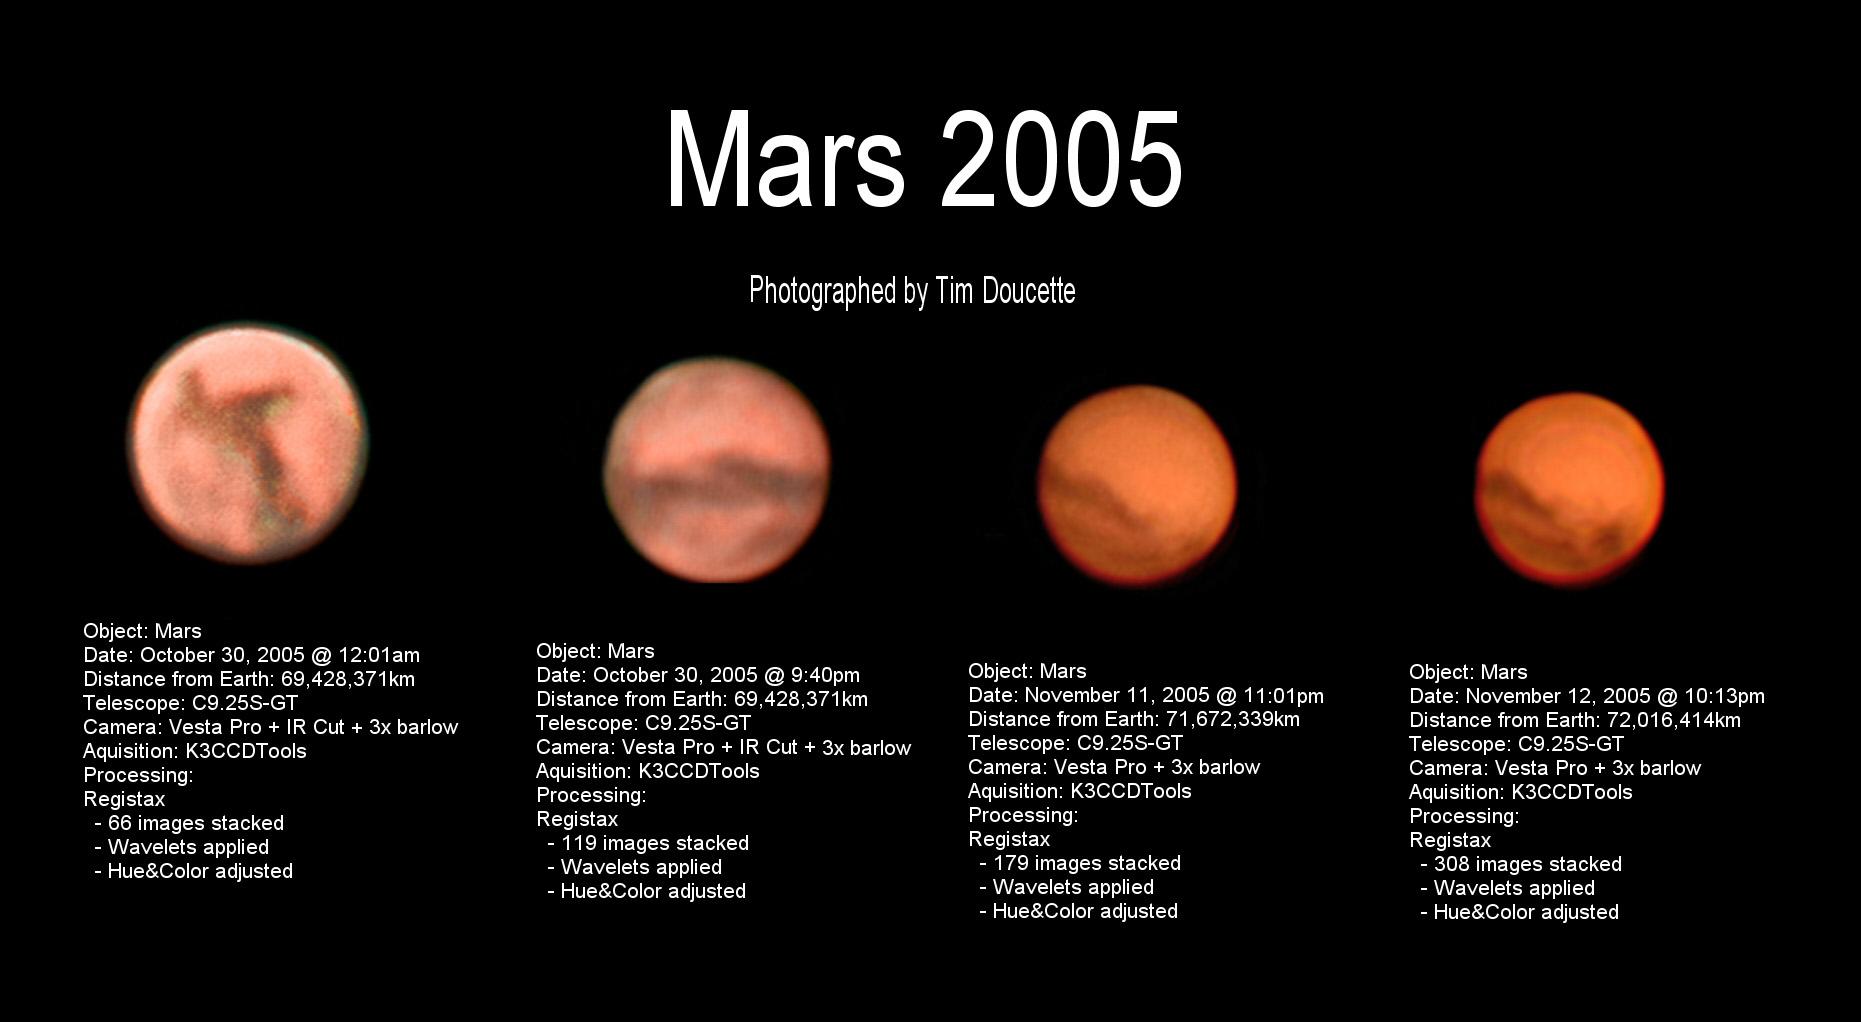 Mars March